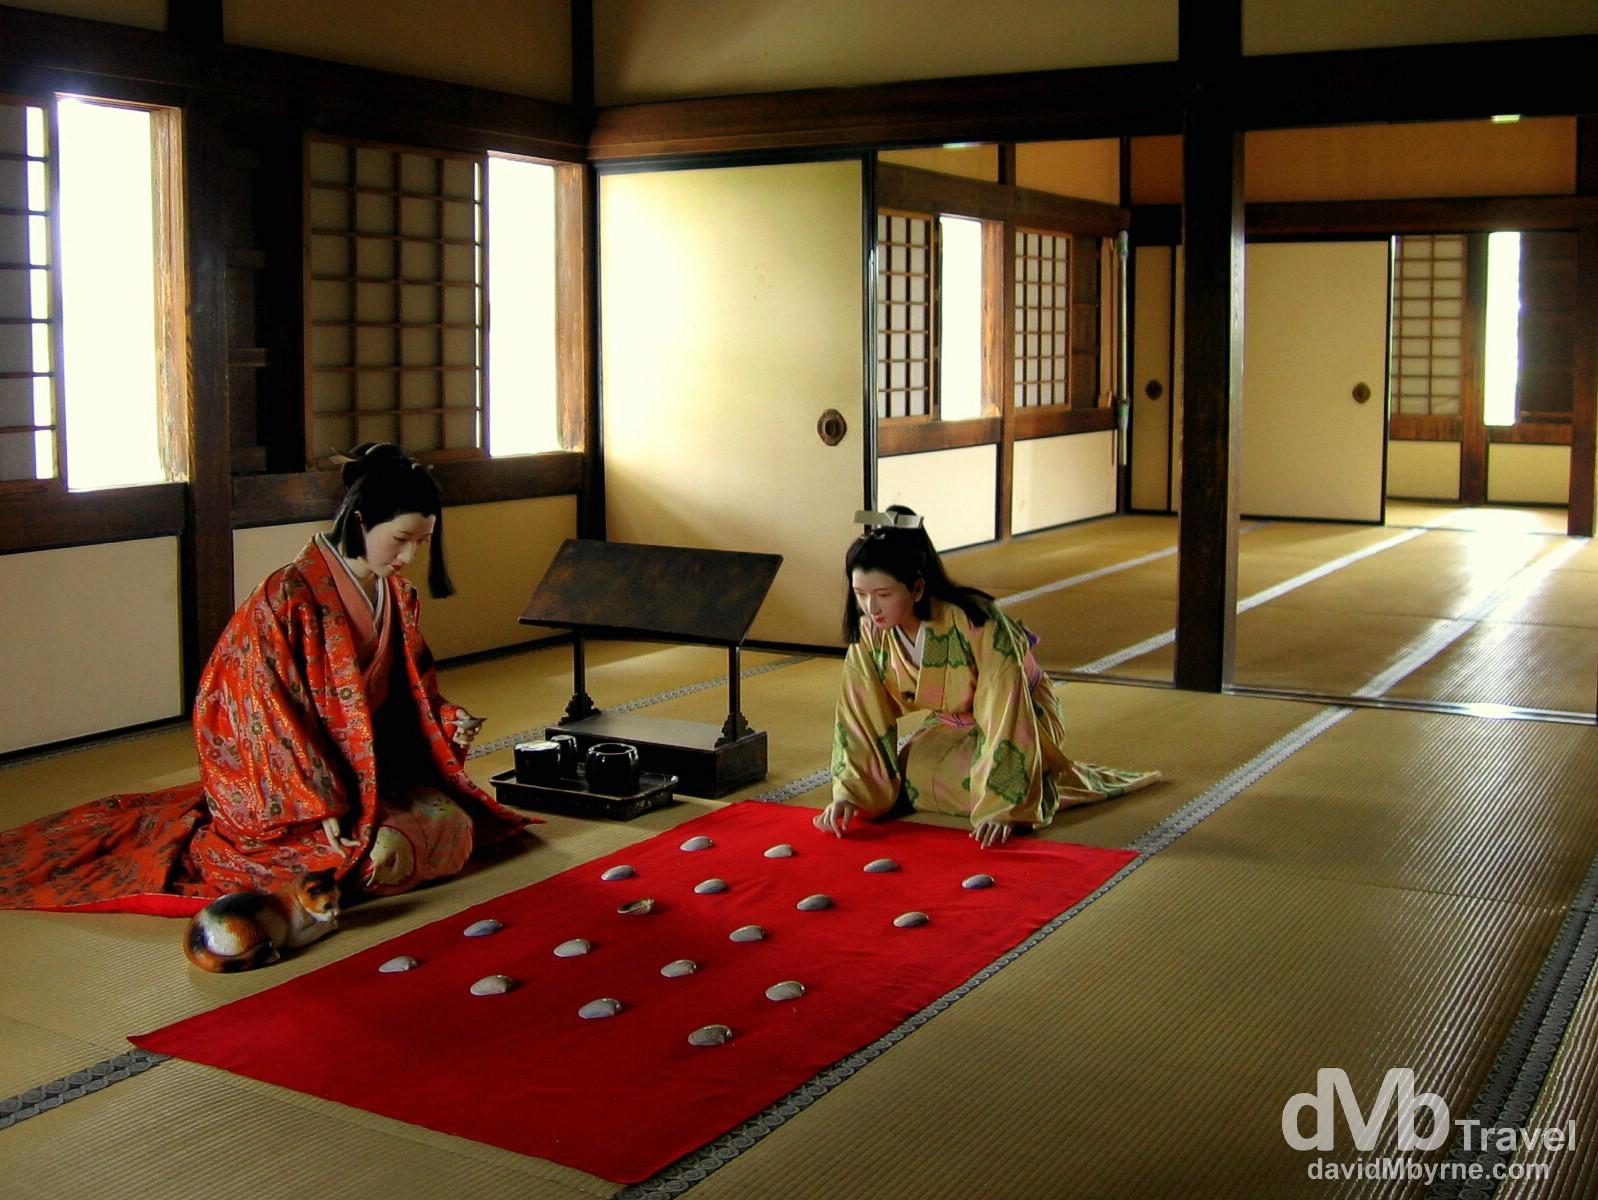 A reenactment of royal life in Himeji Castle, Himeji, Honshu, Japan. July 21st, 2005.